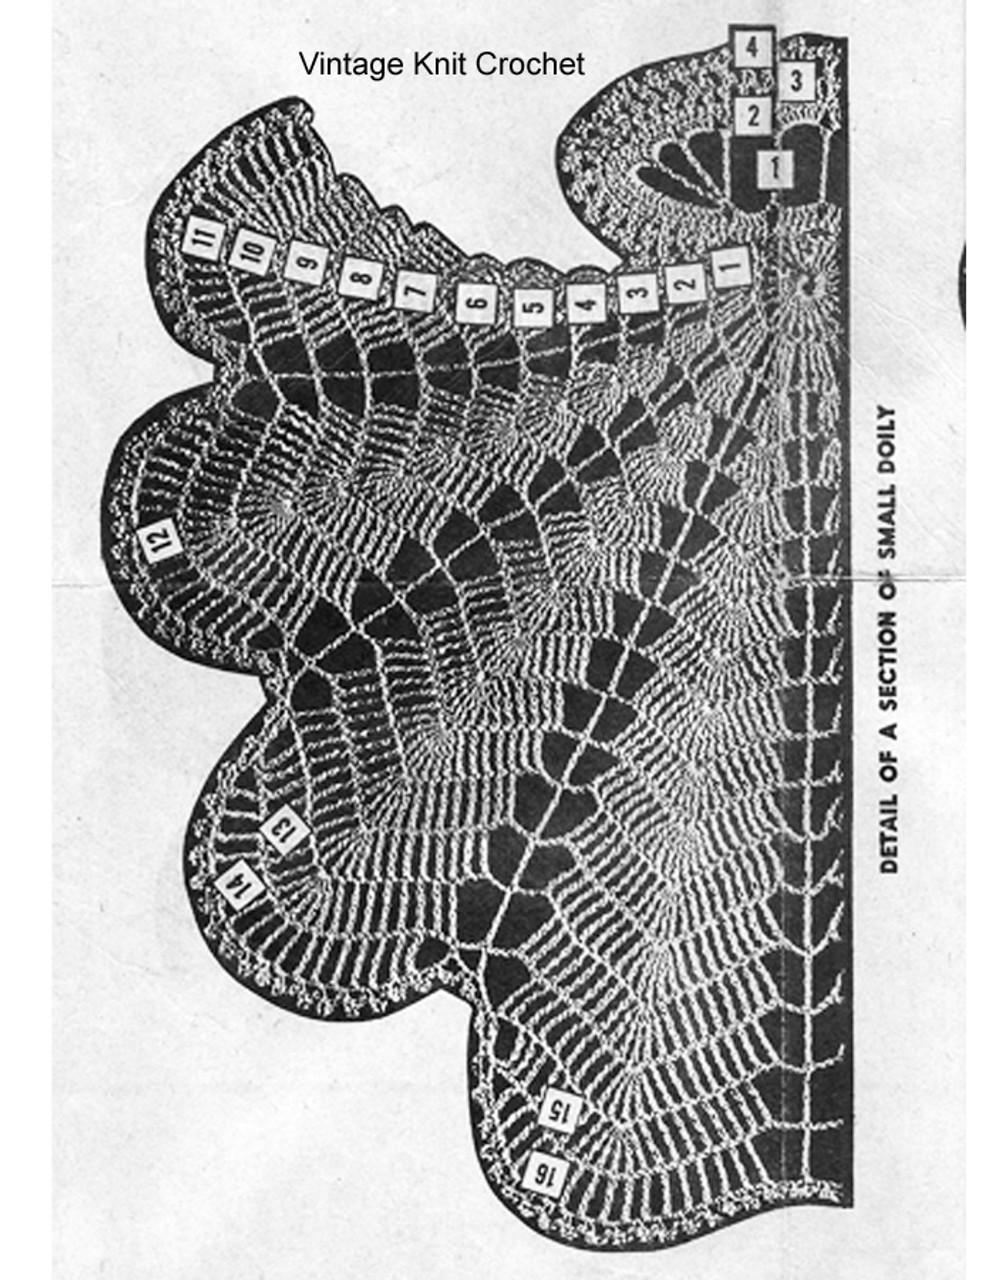 Vintage Shell Crochet Doily Illustration